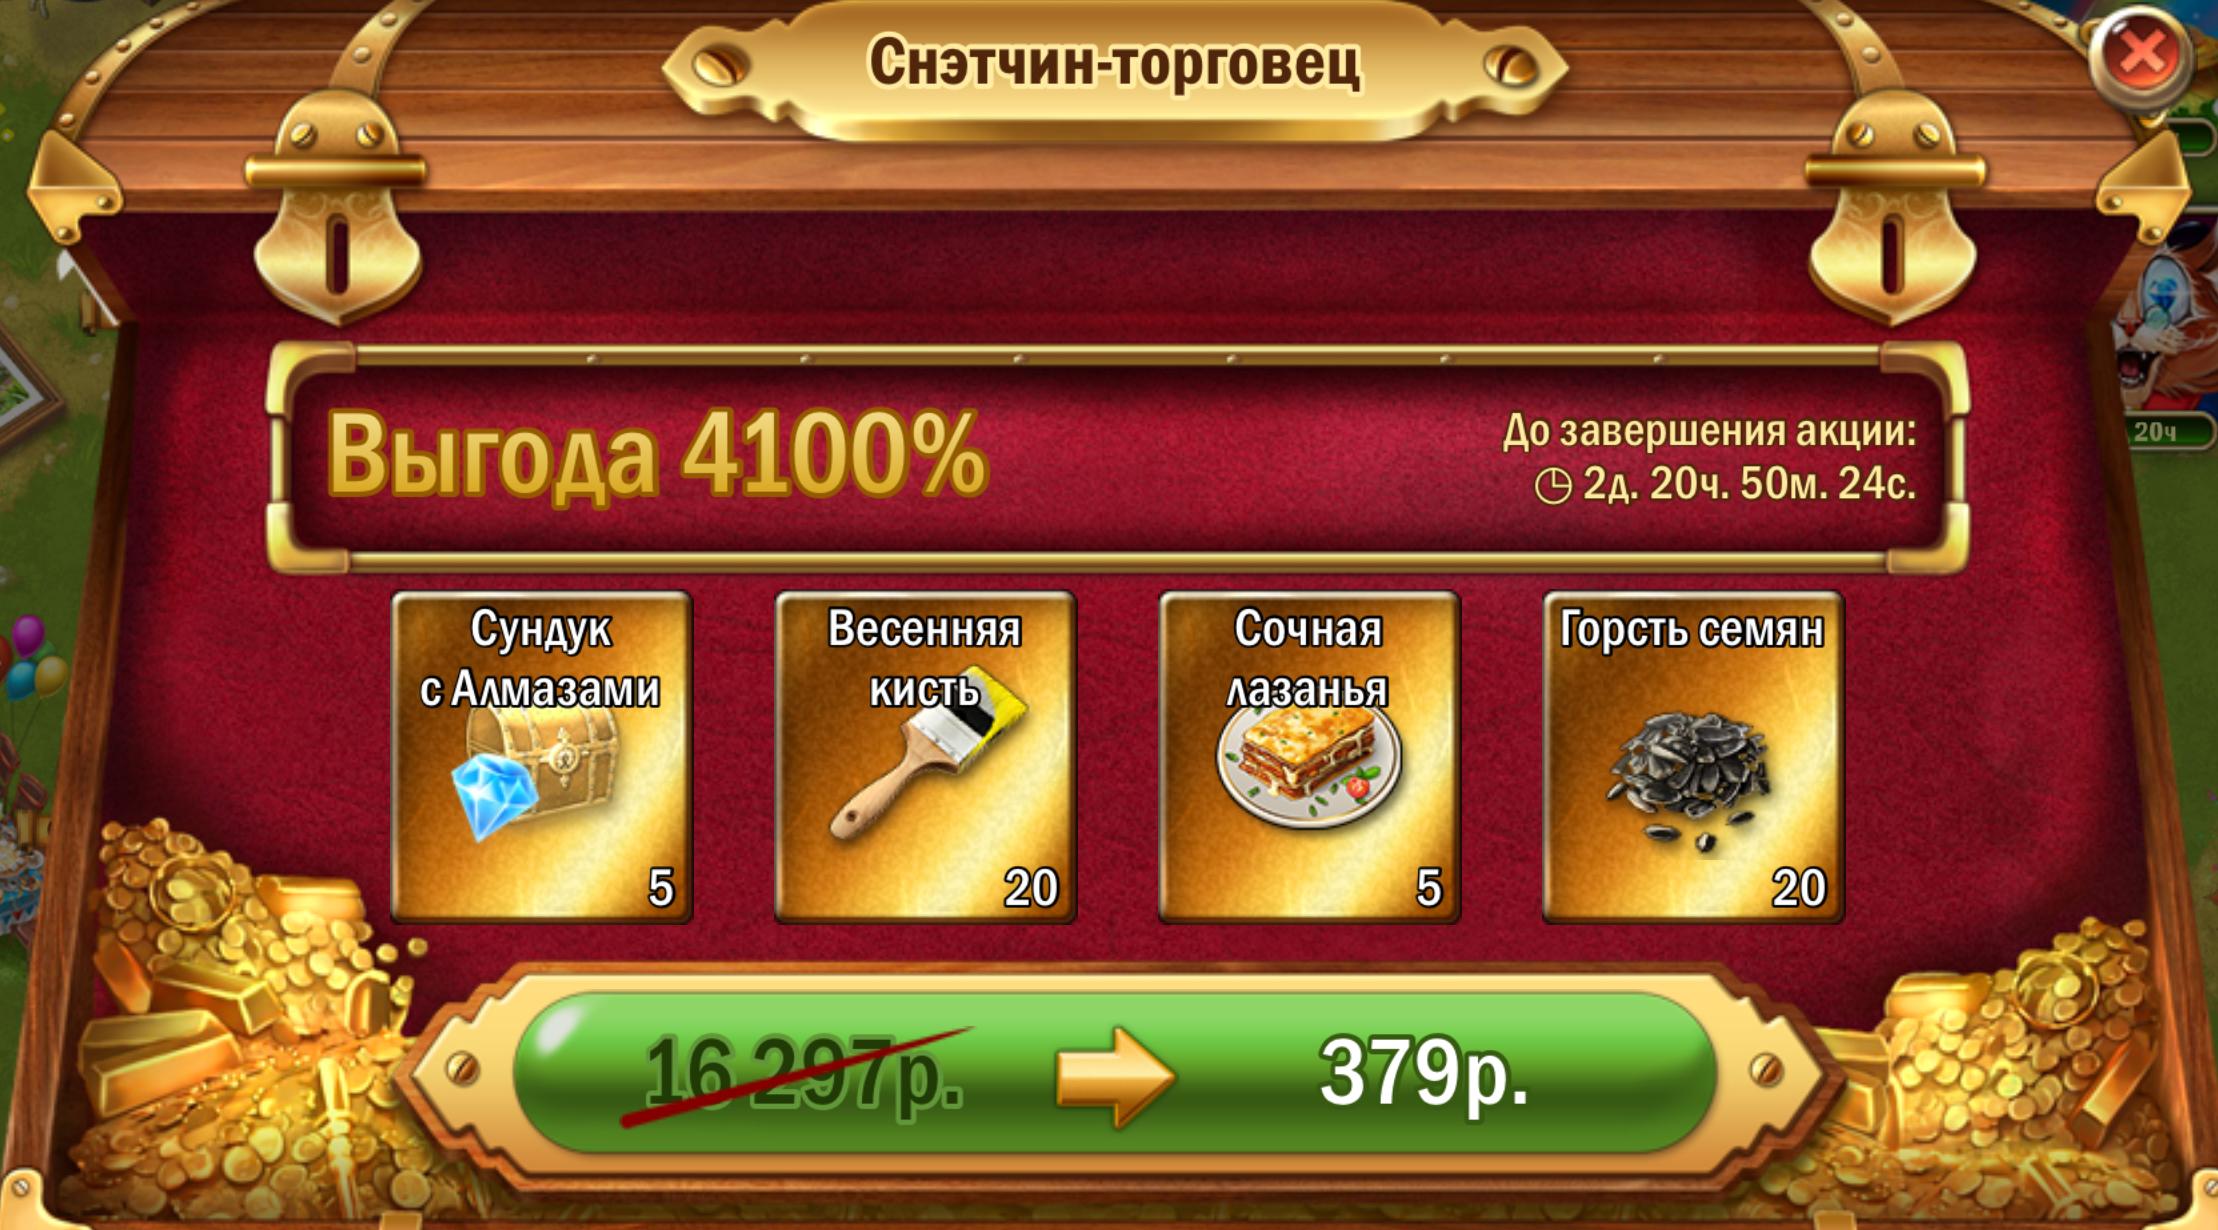 http://s7.uploads.ru/TO7Vs.jpg